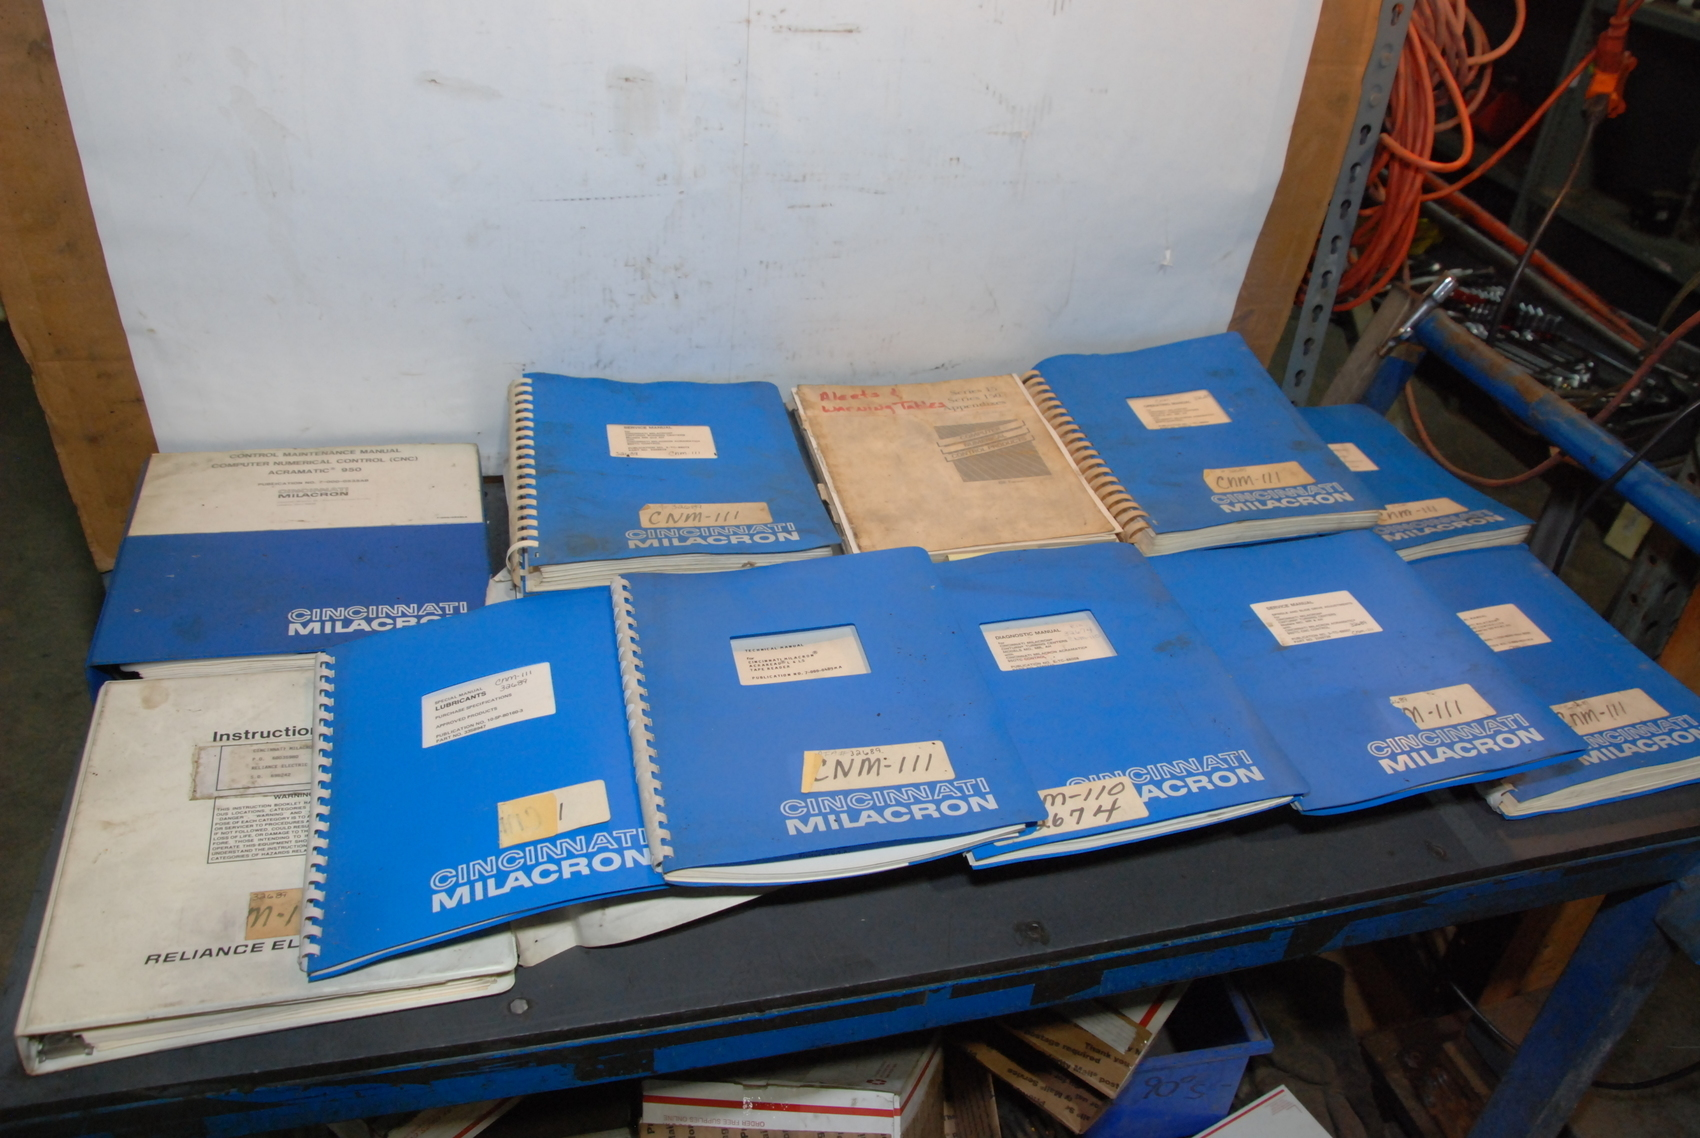 Cincinnati Milacron CNC Lathe CNM-111 Manuals,Instructions